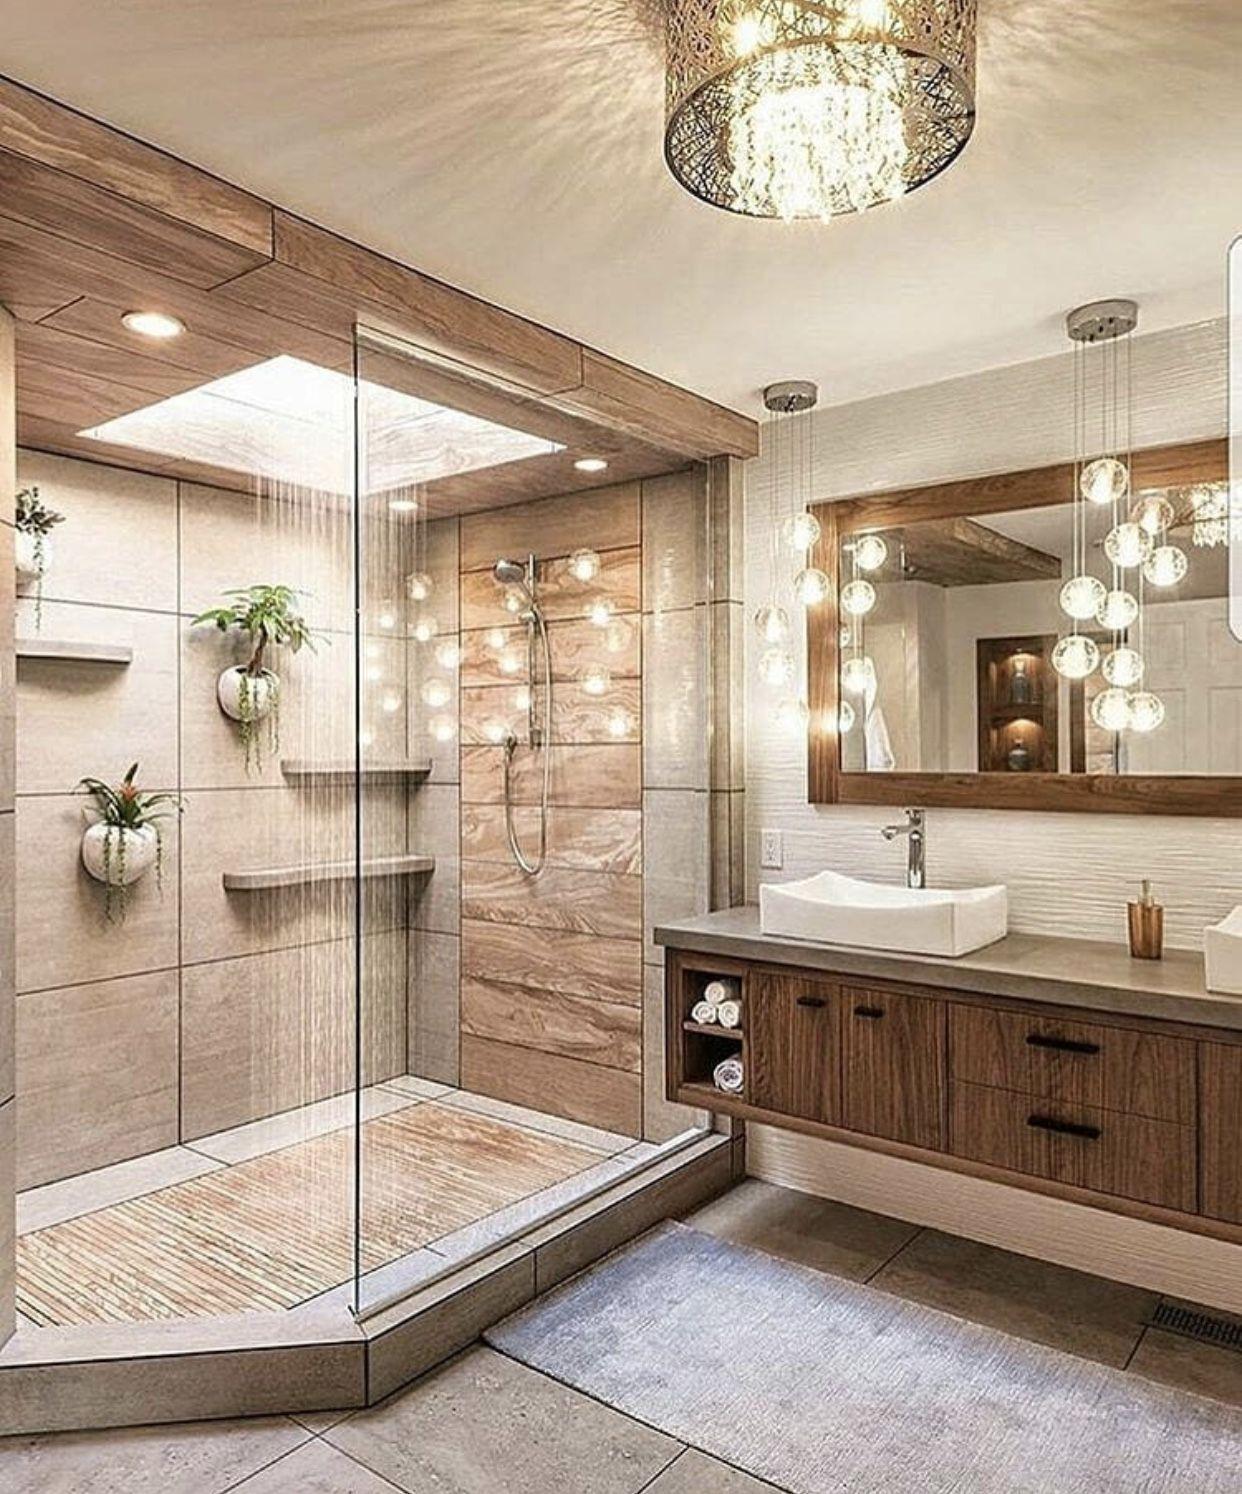 Shower Area In Dark Colors Showertiles In 2020 Haus Design Haus Innenarchitektur